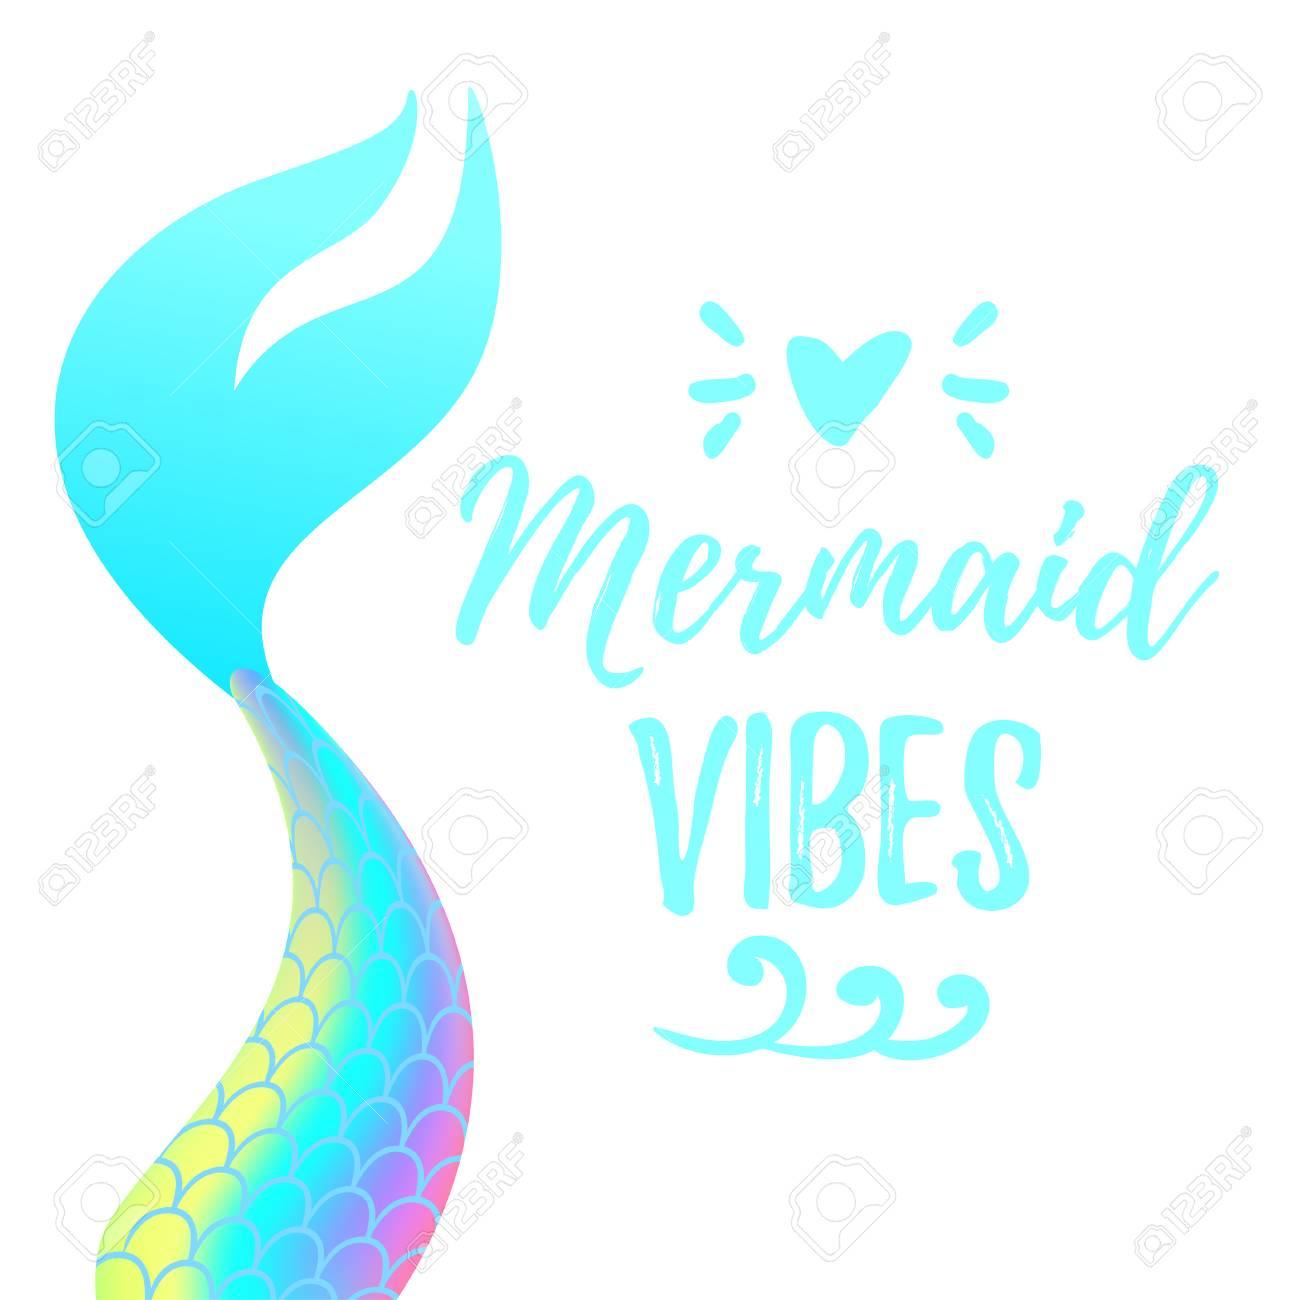 Vector cartoon style illustration of cute mermaid tail. Mermay concept. Mythical marine princess. - 101119991